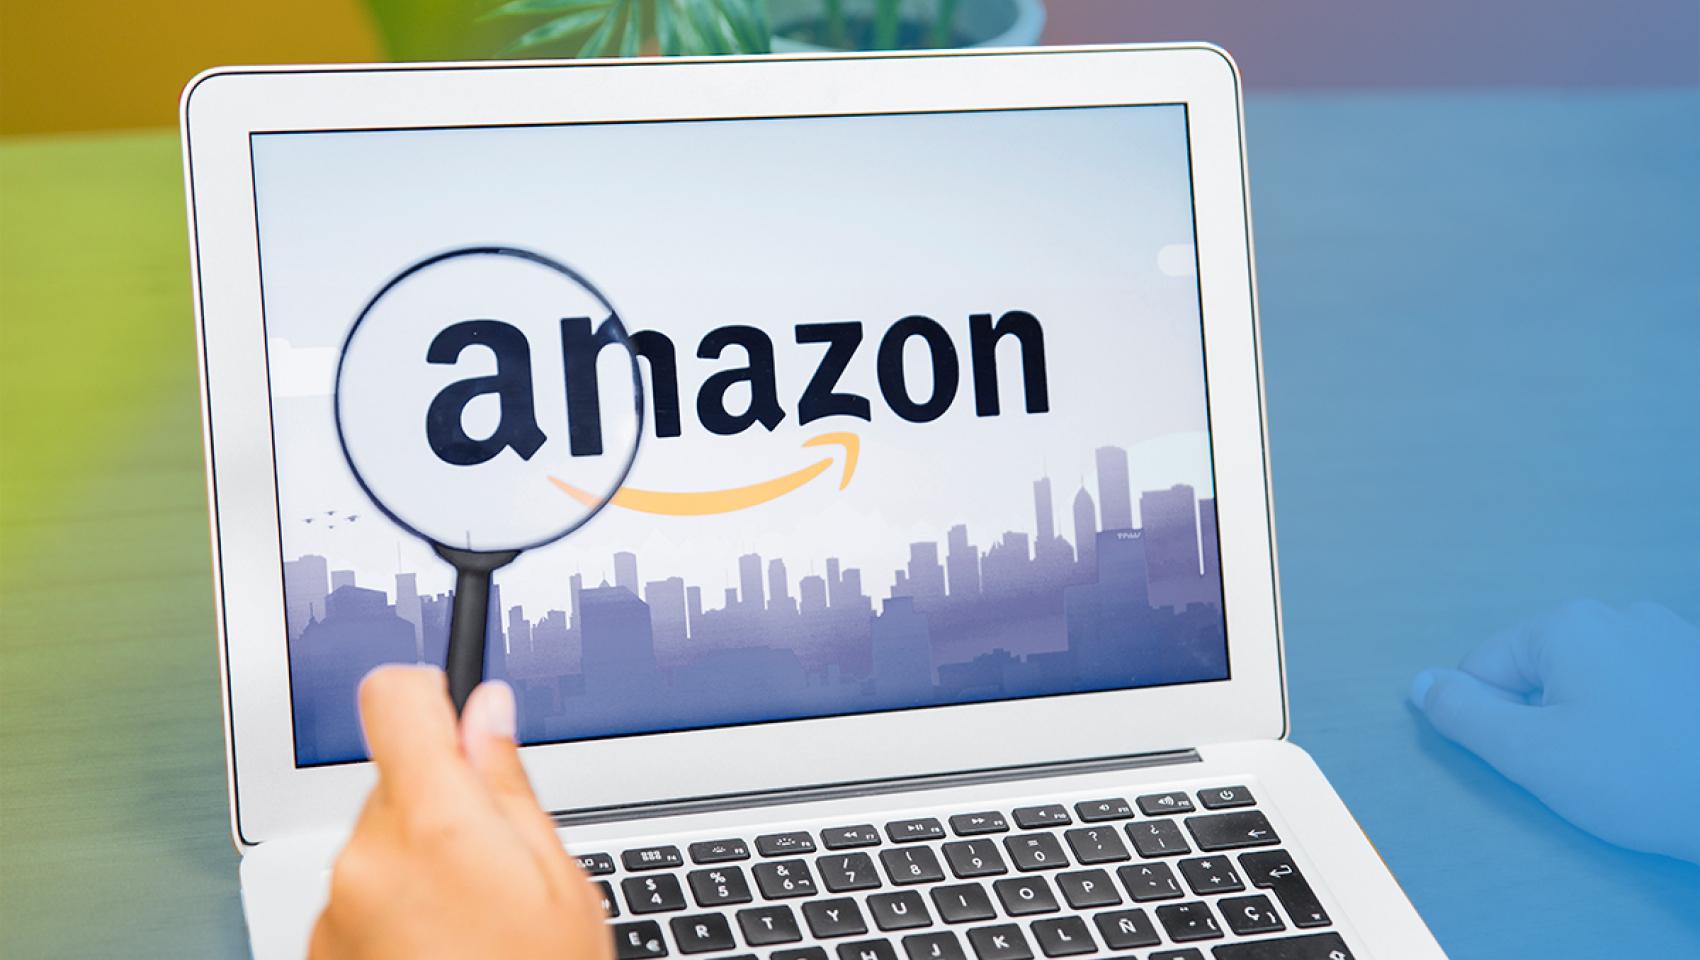 Про работу в Amazon. Взгляд изнутри